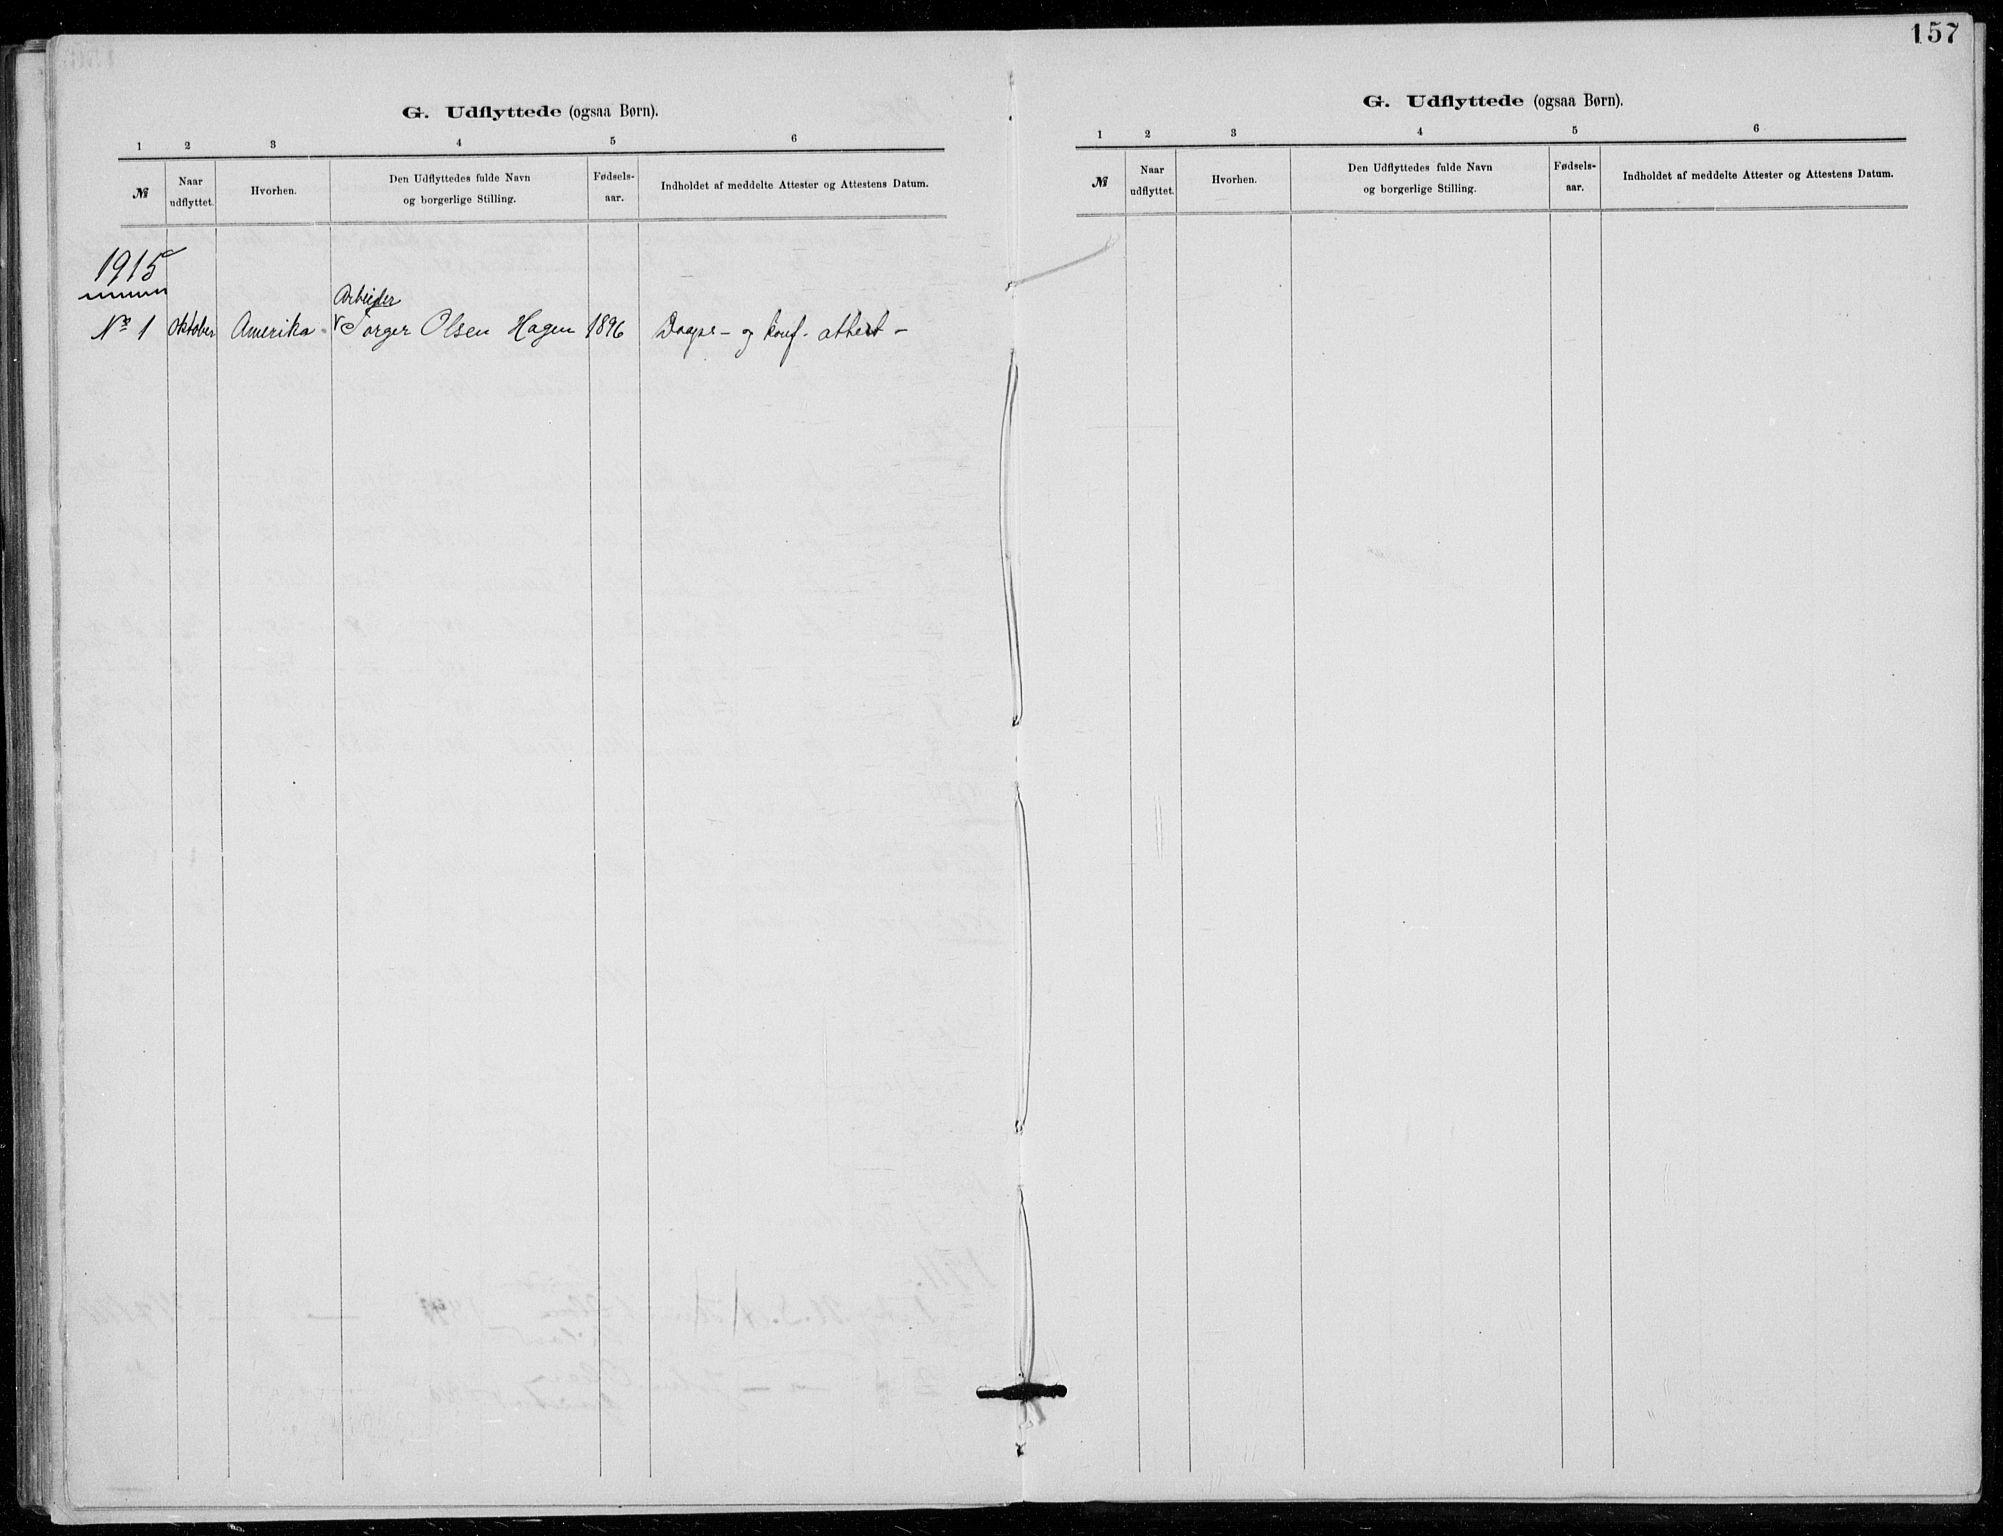 SAKO, Tinn kirkebøker, F/Fb/L0002: Ministerialbok nr. II 2, 1878-1917, s. 157